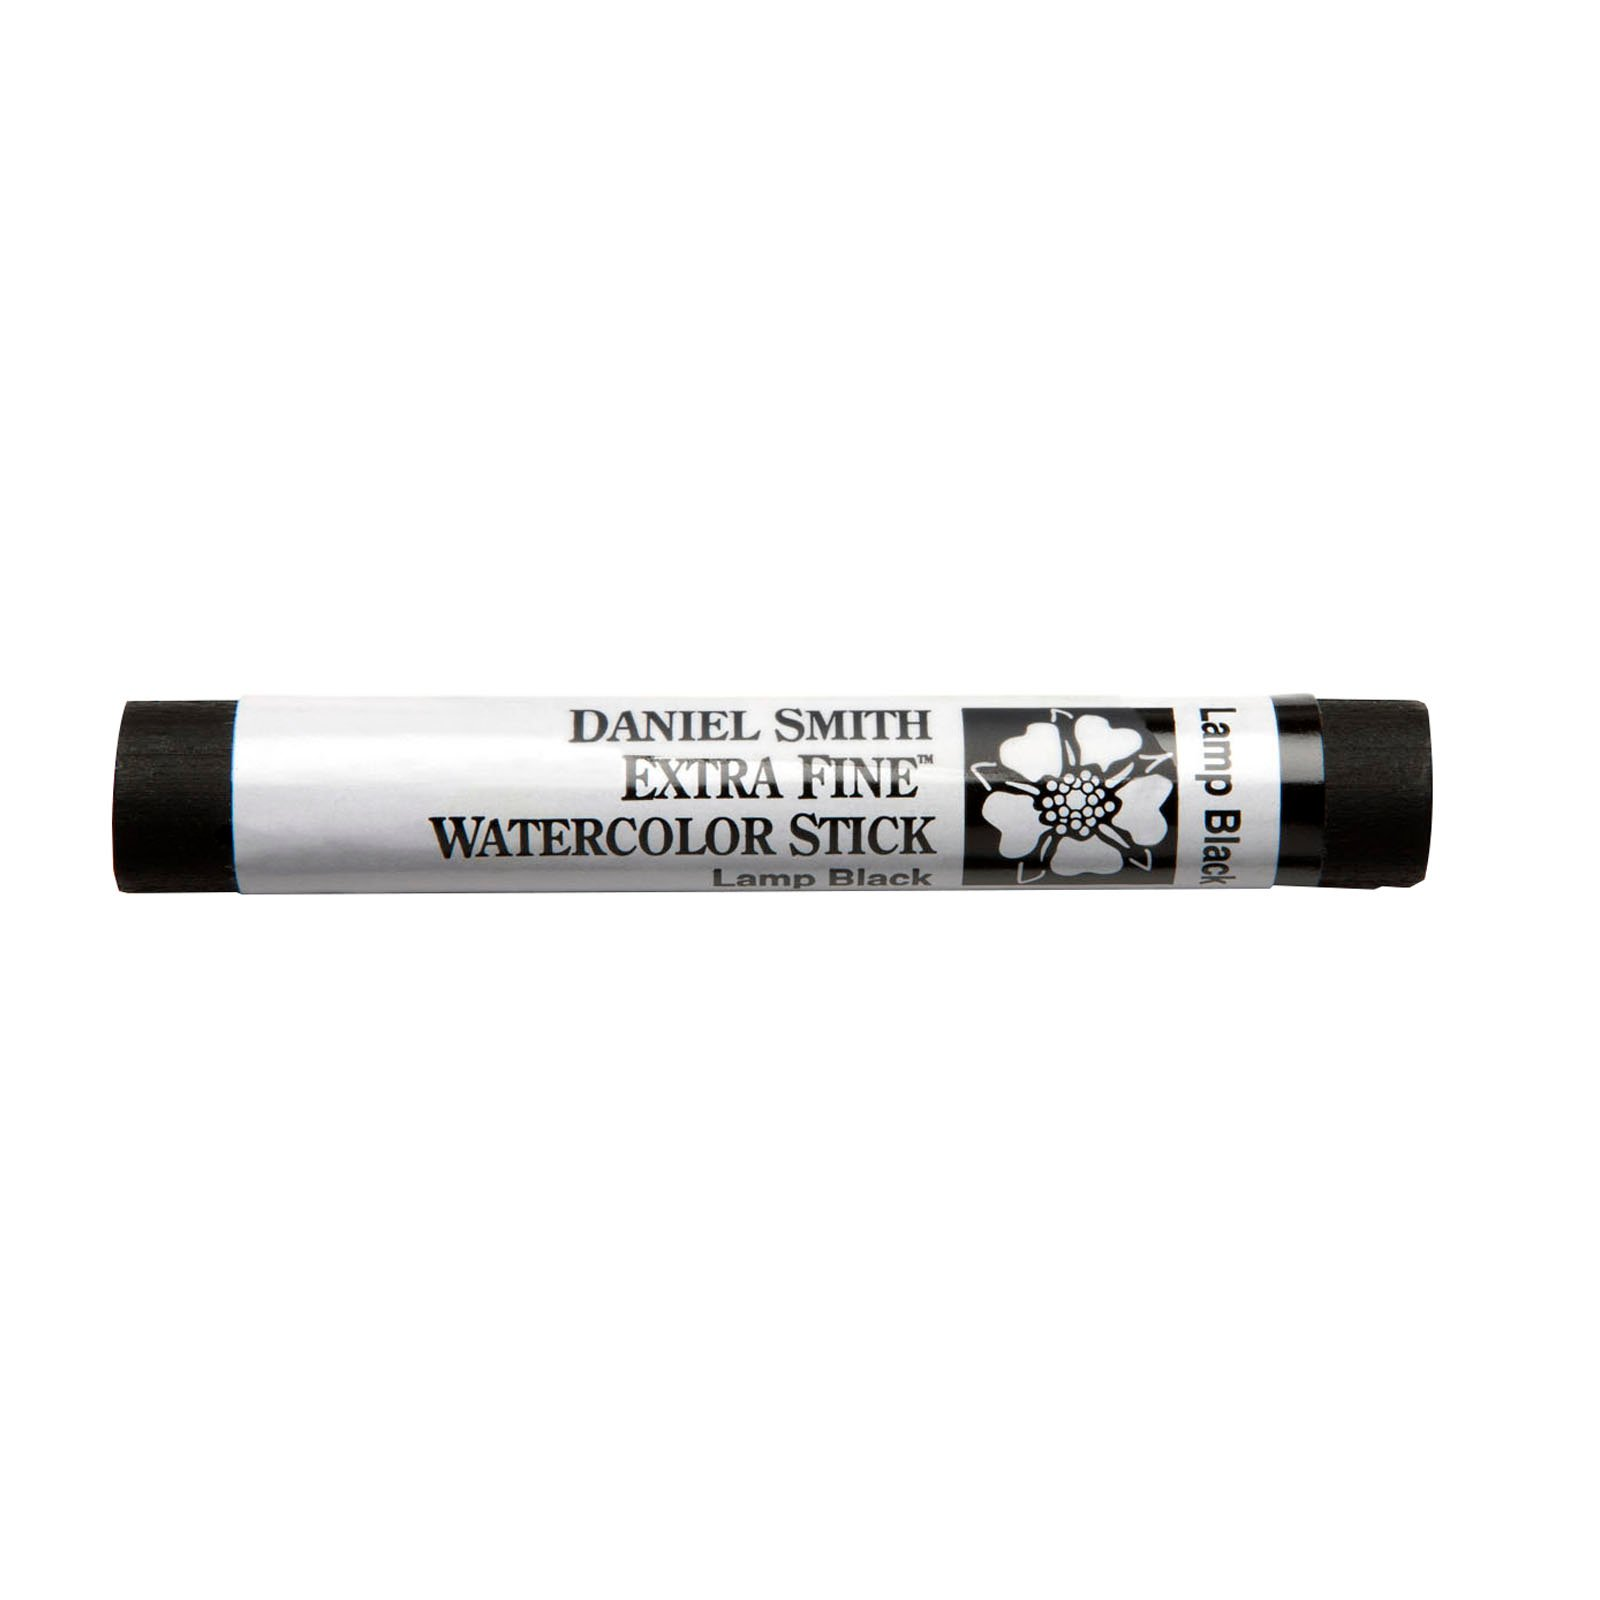 Extra-Fine Watercolor Sticks, Lamp Black - 12ml Stick